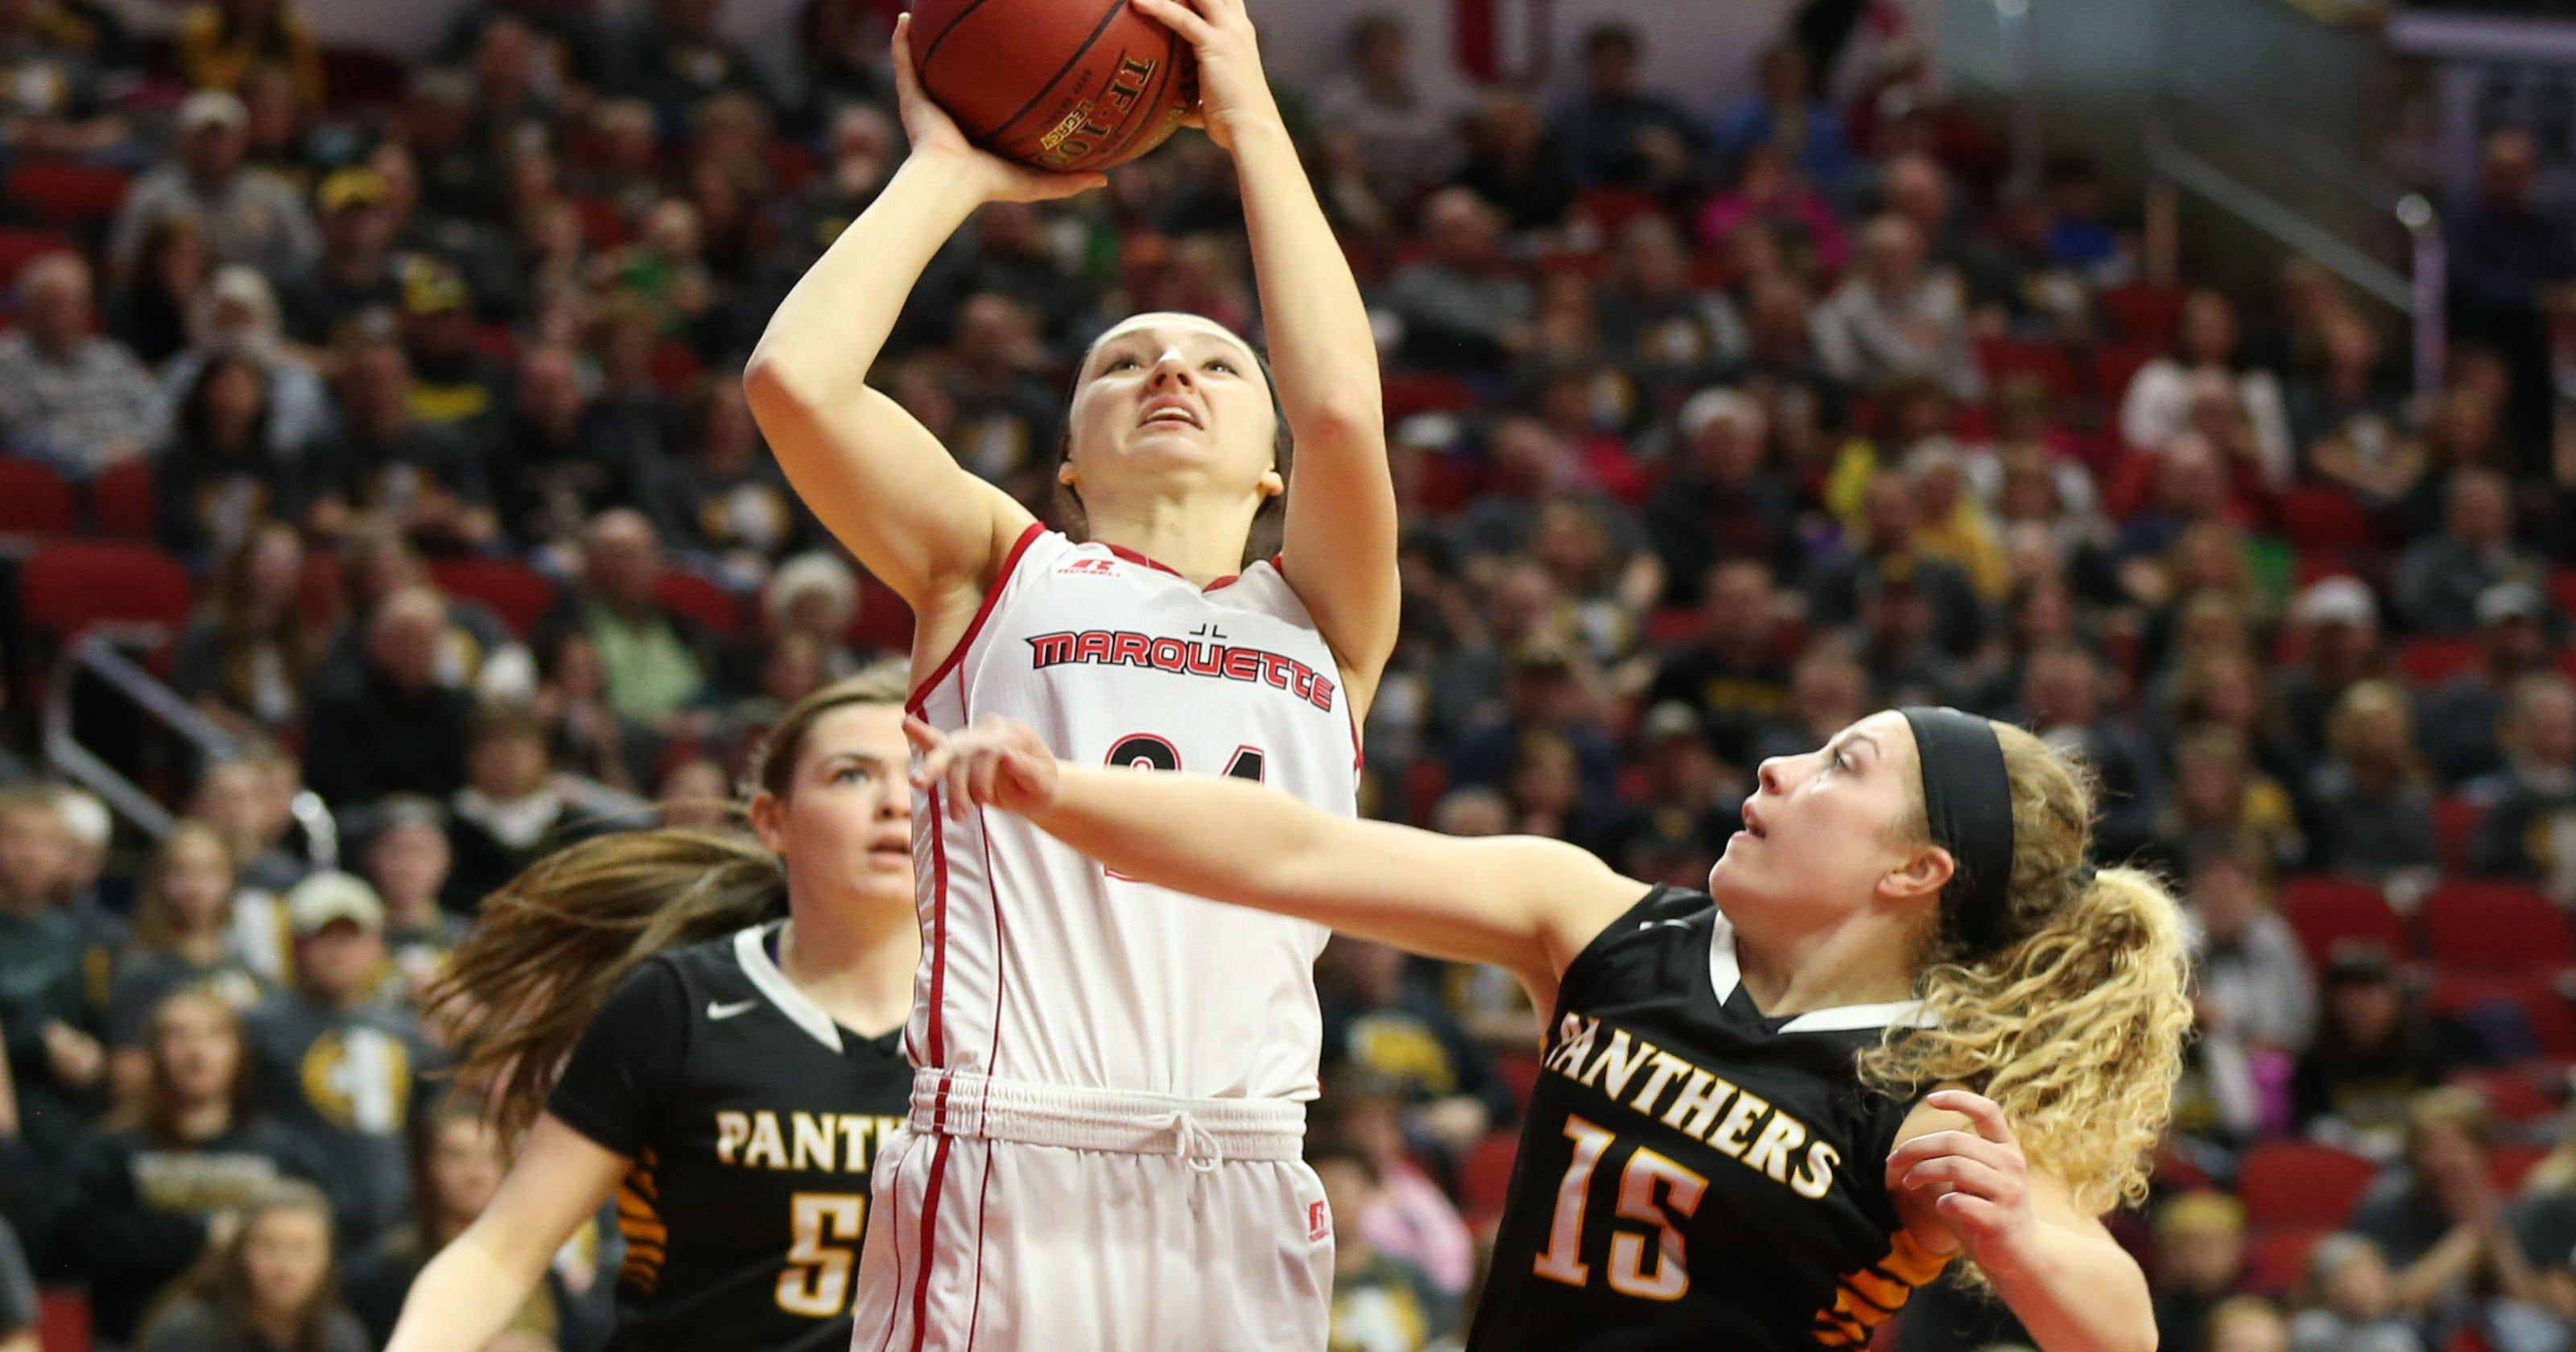 Updates: Day 1 of the Iowa girls state basketball tournament